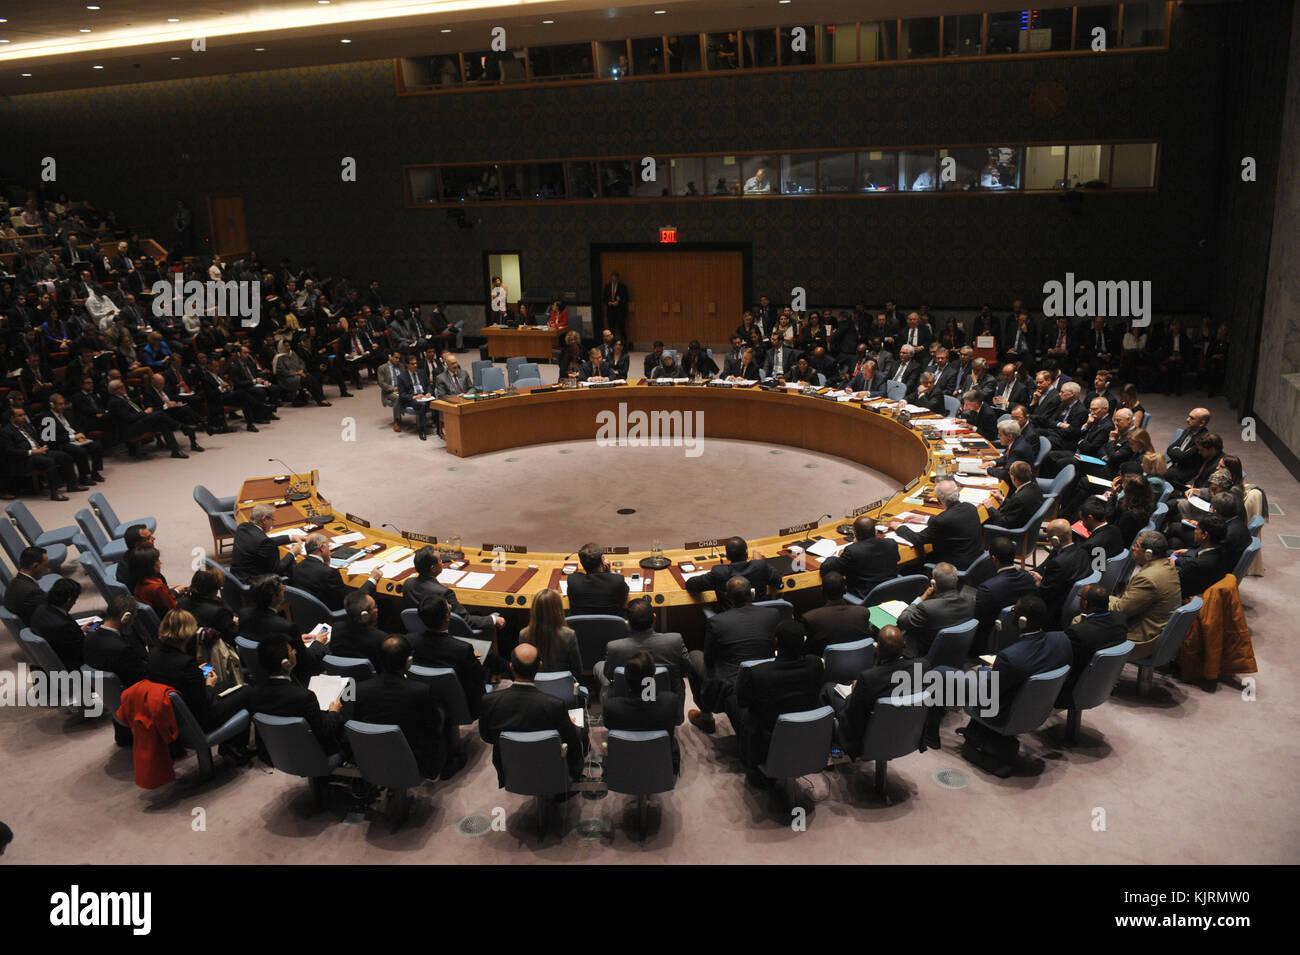 NEW YORK, NY - DECEMBER 18:  Following the adoption of the resolution, John Kerry (centre), United States Secretary - Stock Image